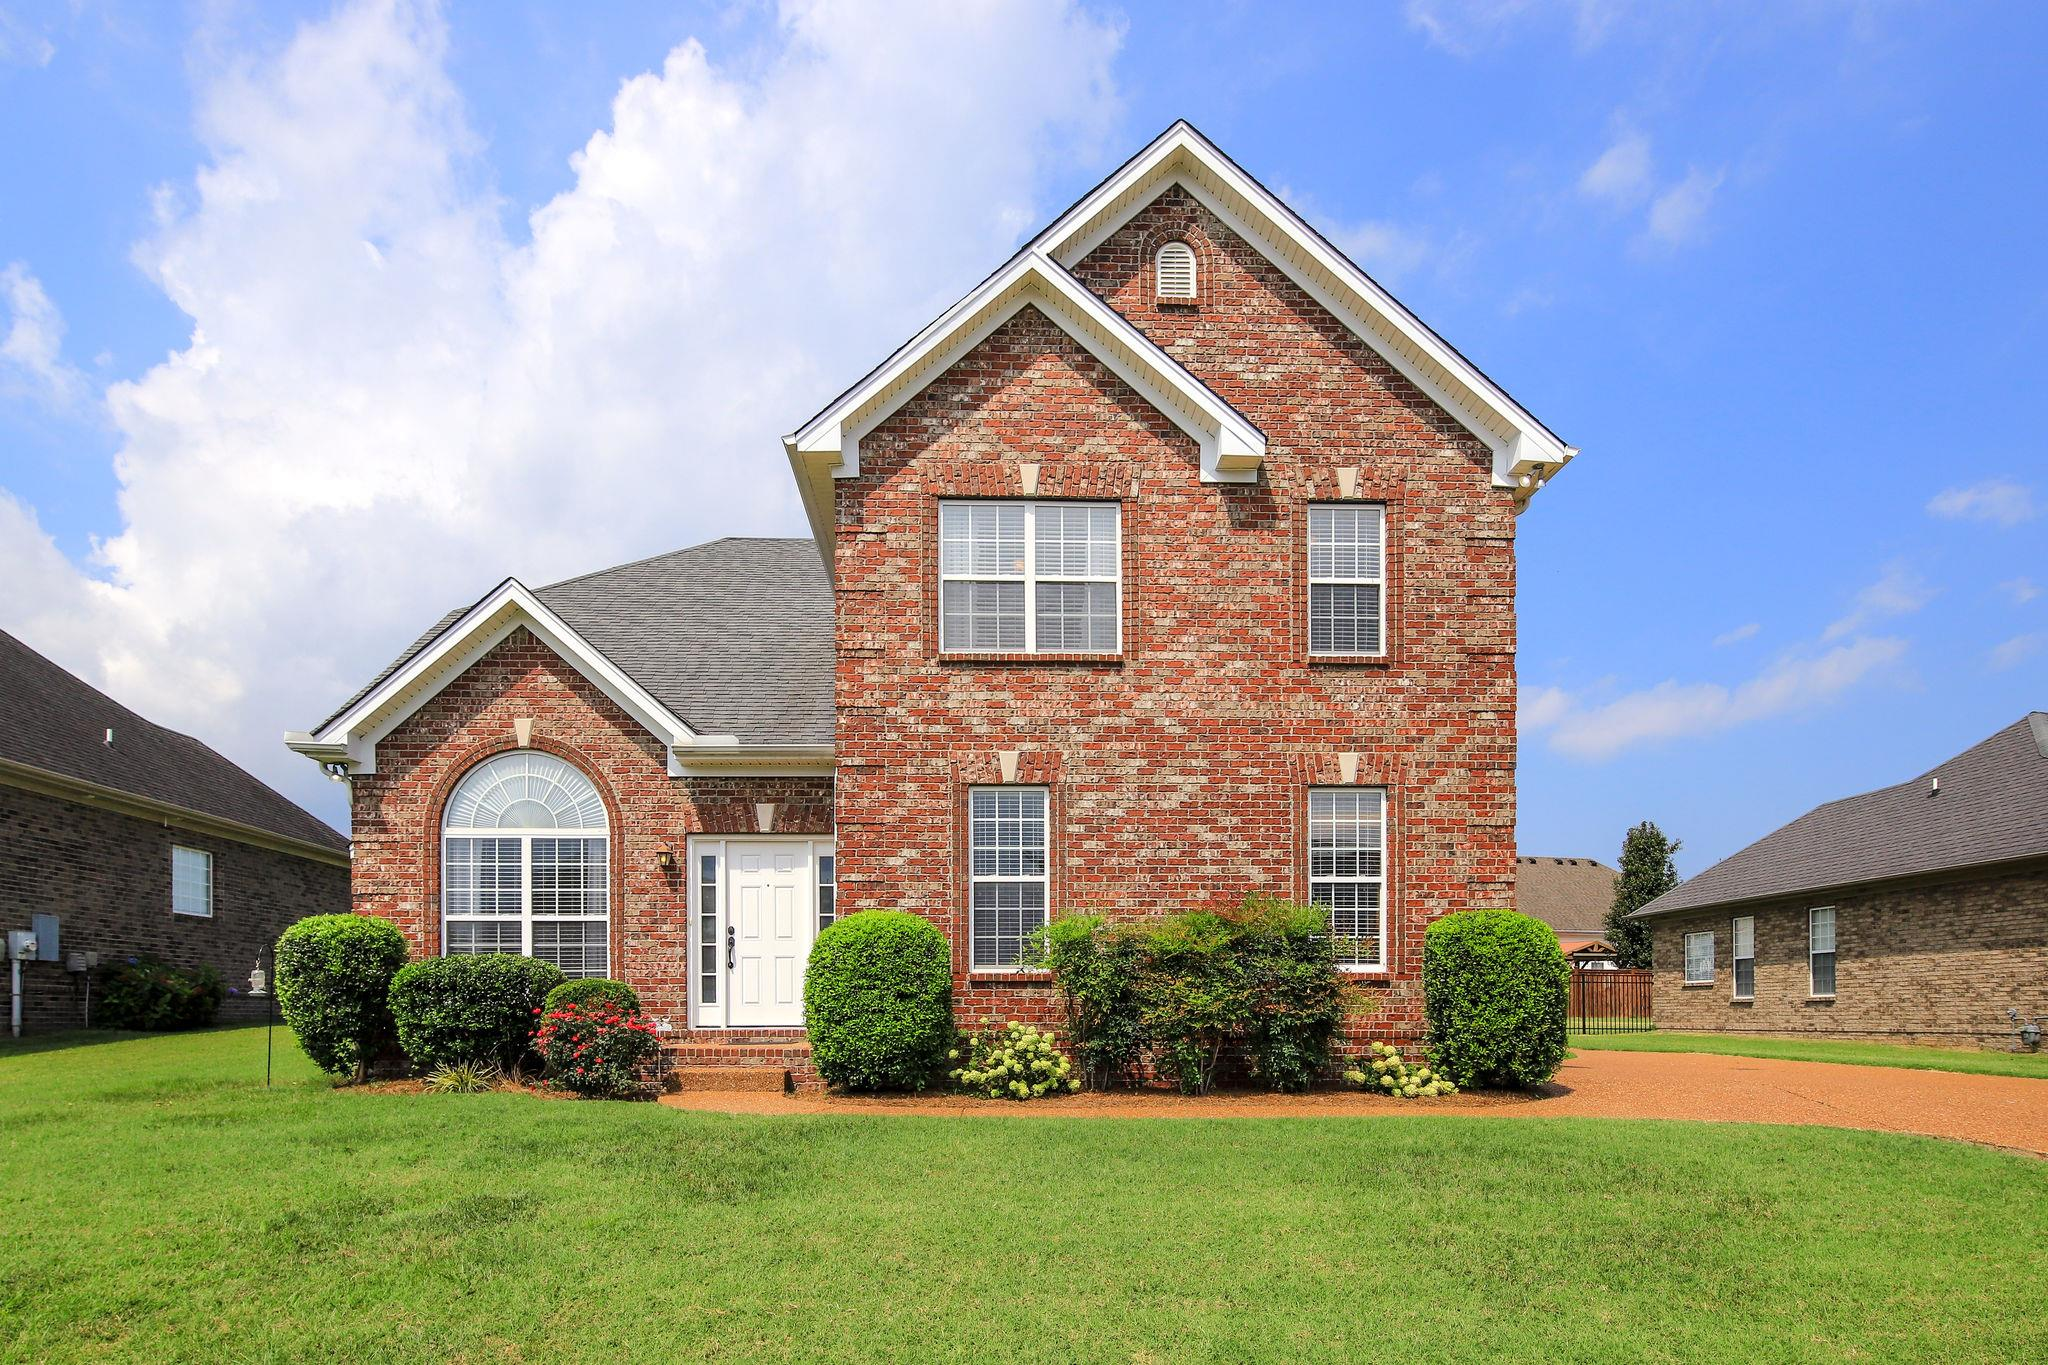 131 McKain Crossing, Hendersonville, TN 37075 - Hendersonville, TN real estate listing